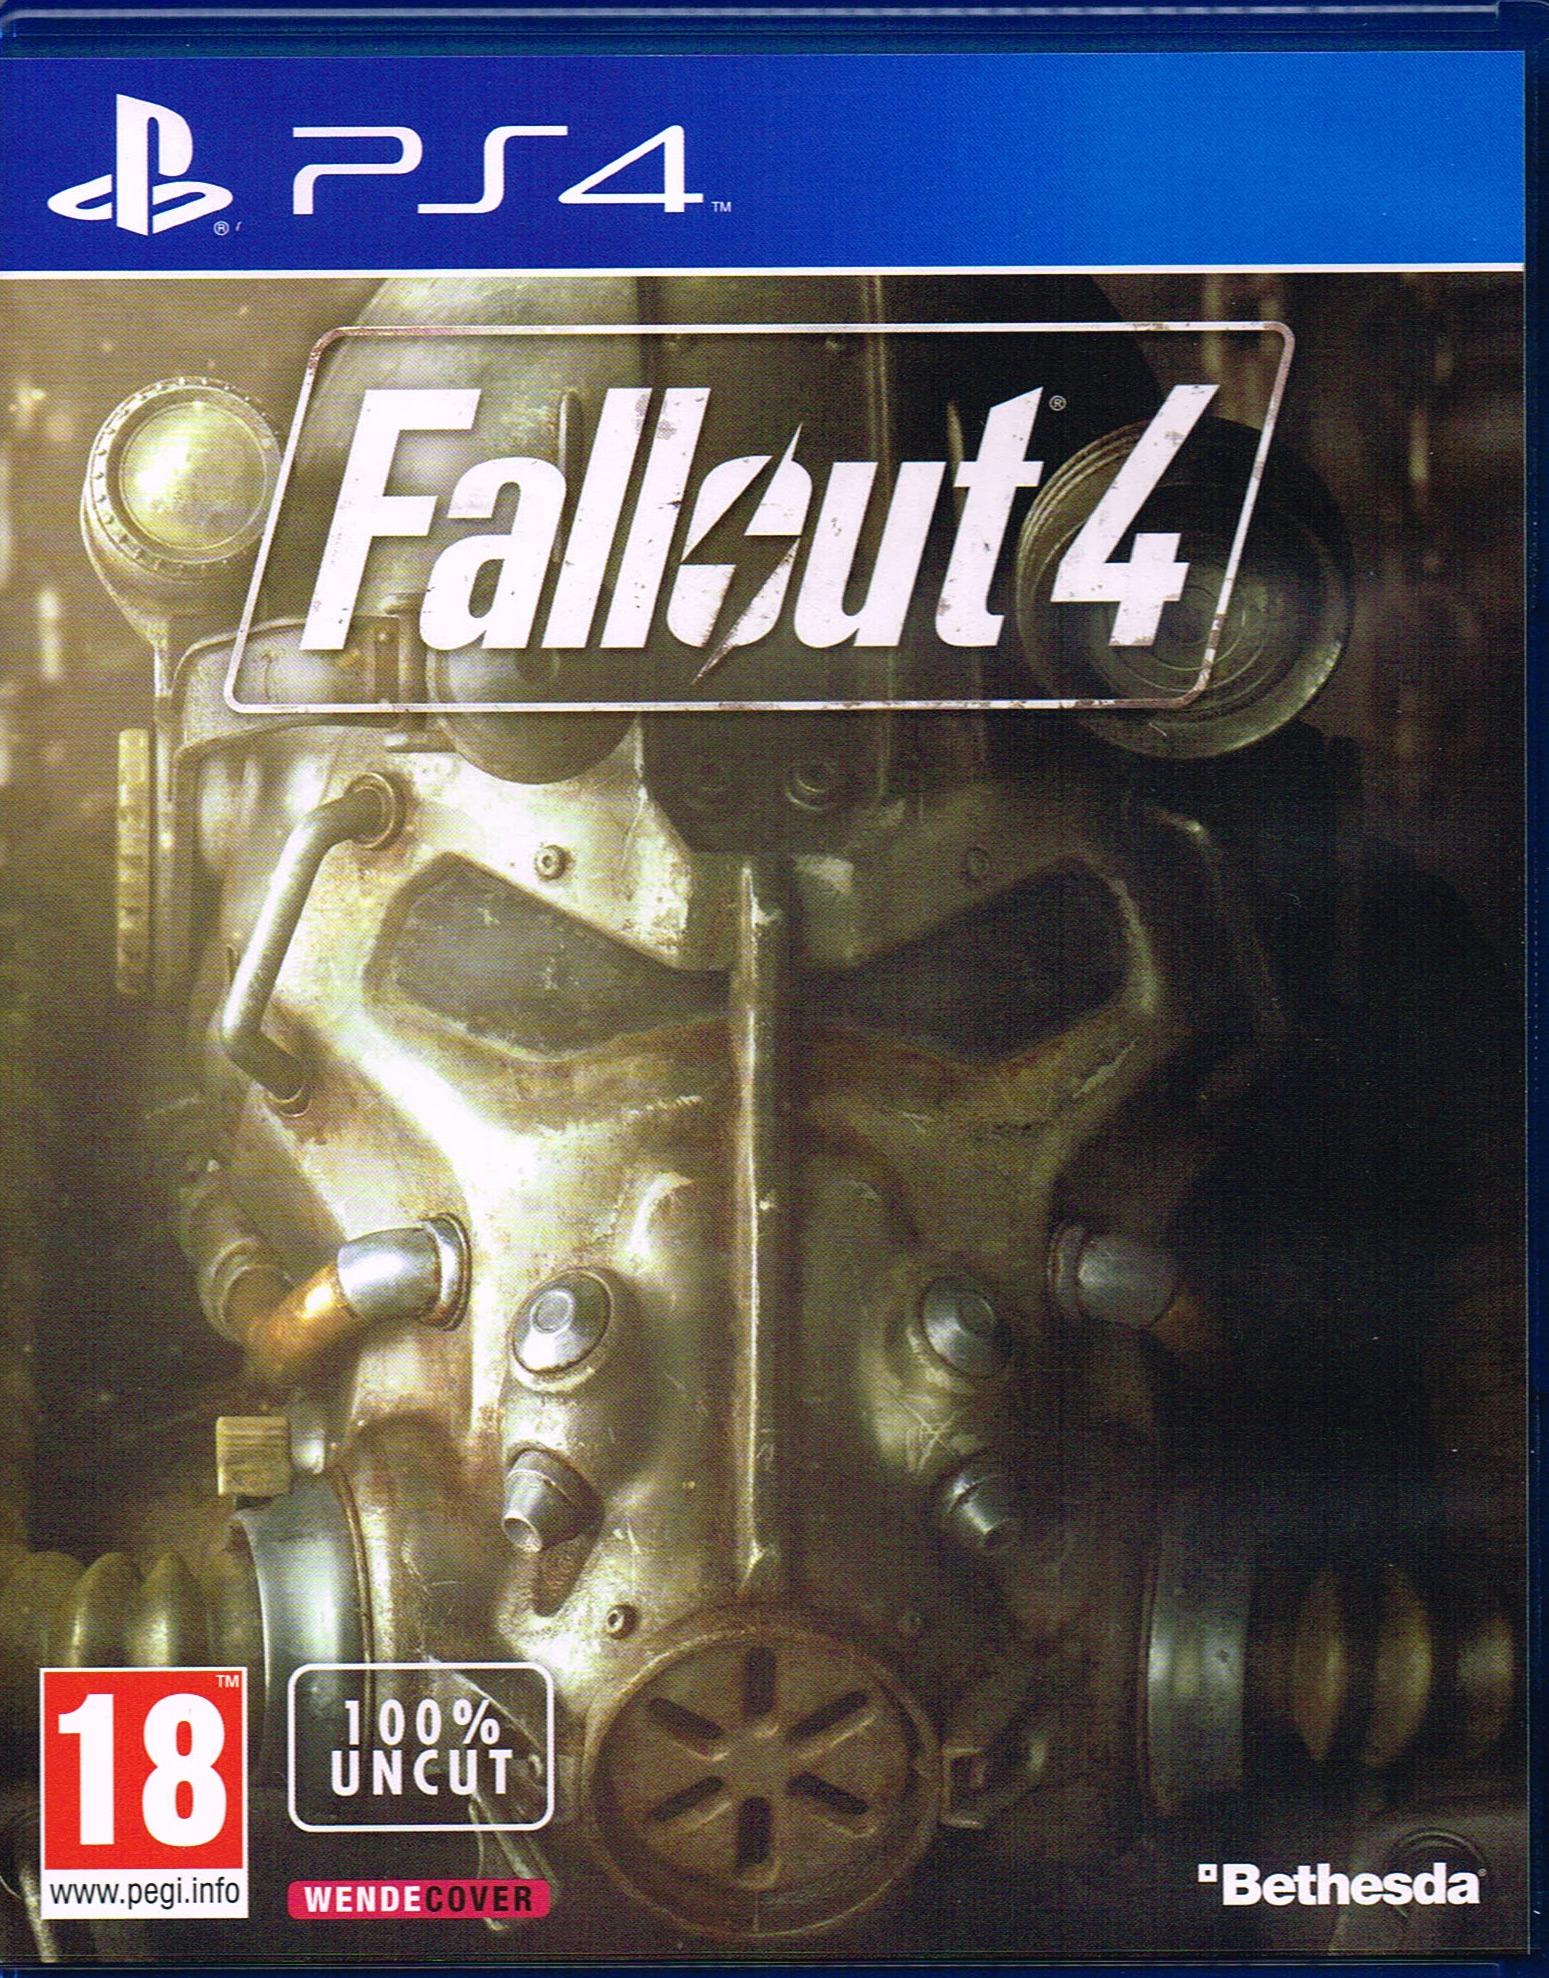 [Gamesware.at] Bestpreis für Fallout 4 PS4/Xbox One um 34,90€ , PC um 33,90€